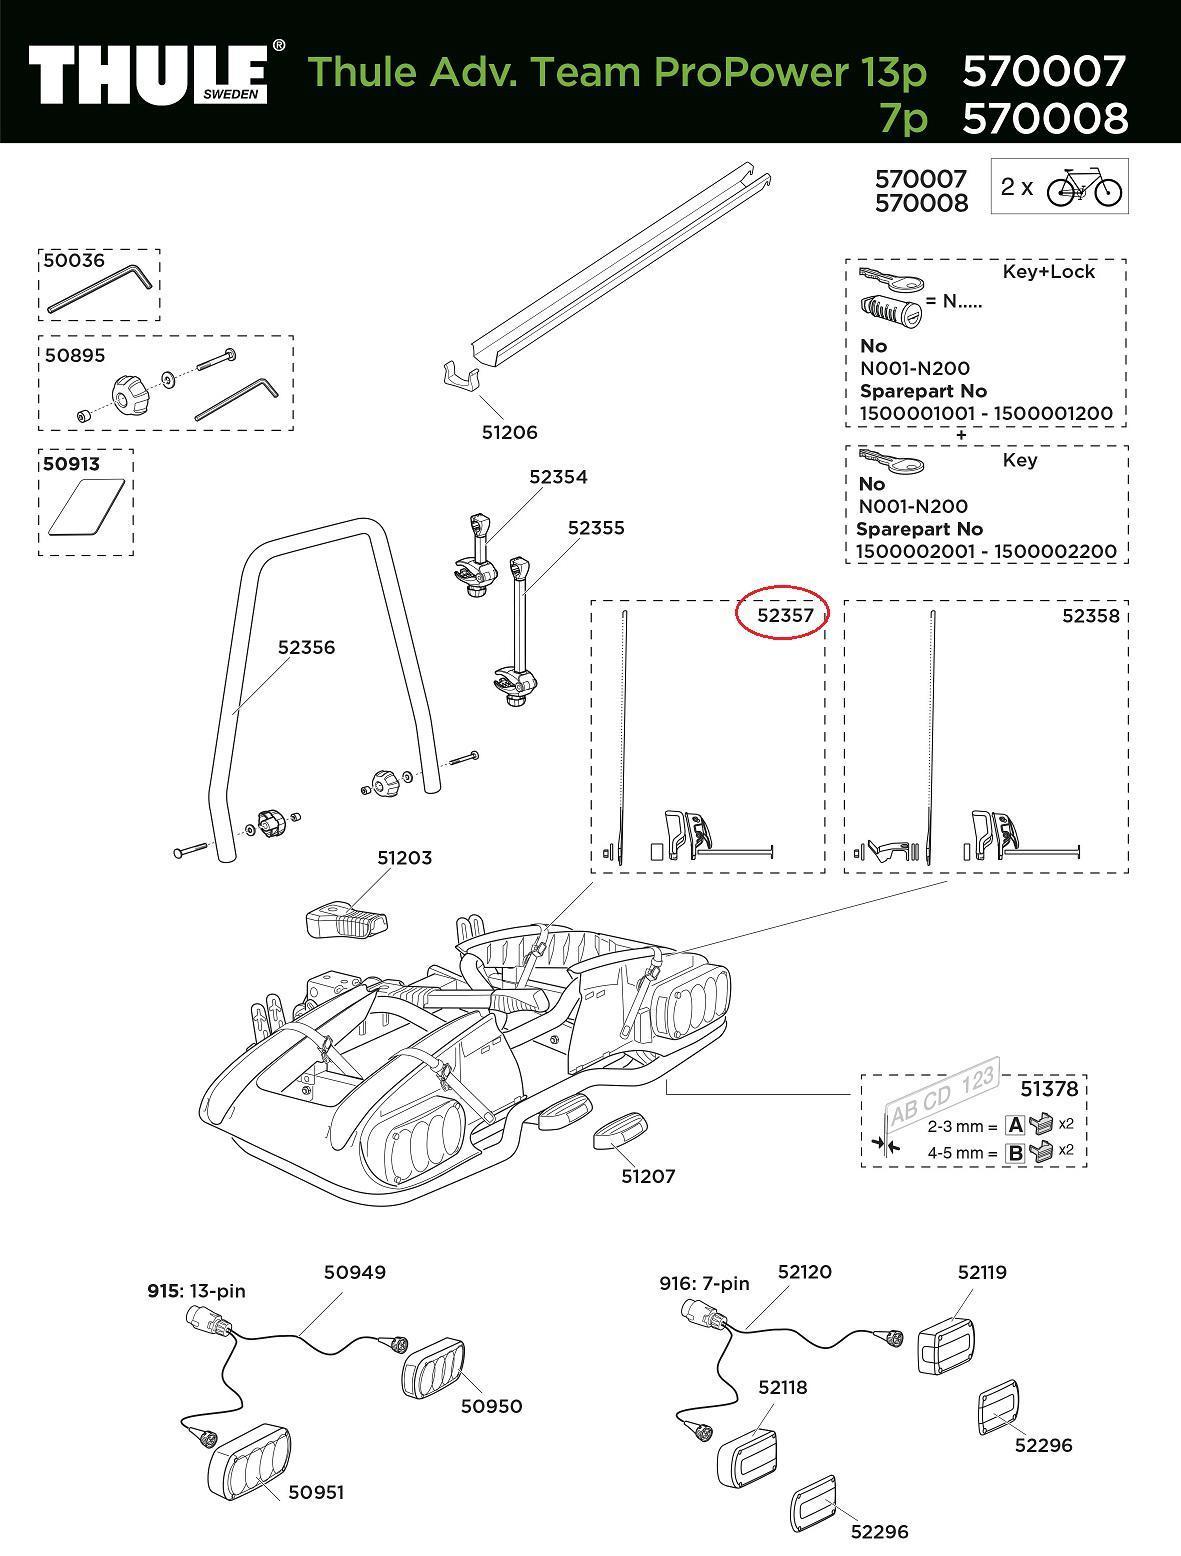 thule halteband anbauteil m schnalle 570007 smu f r. Black Bedroom Furniture Sets. Home Design Ideas